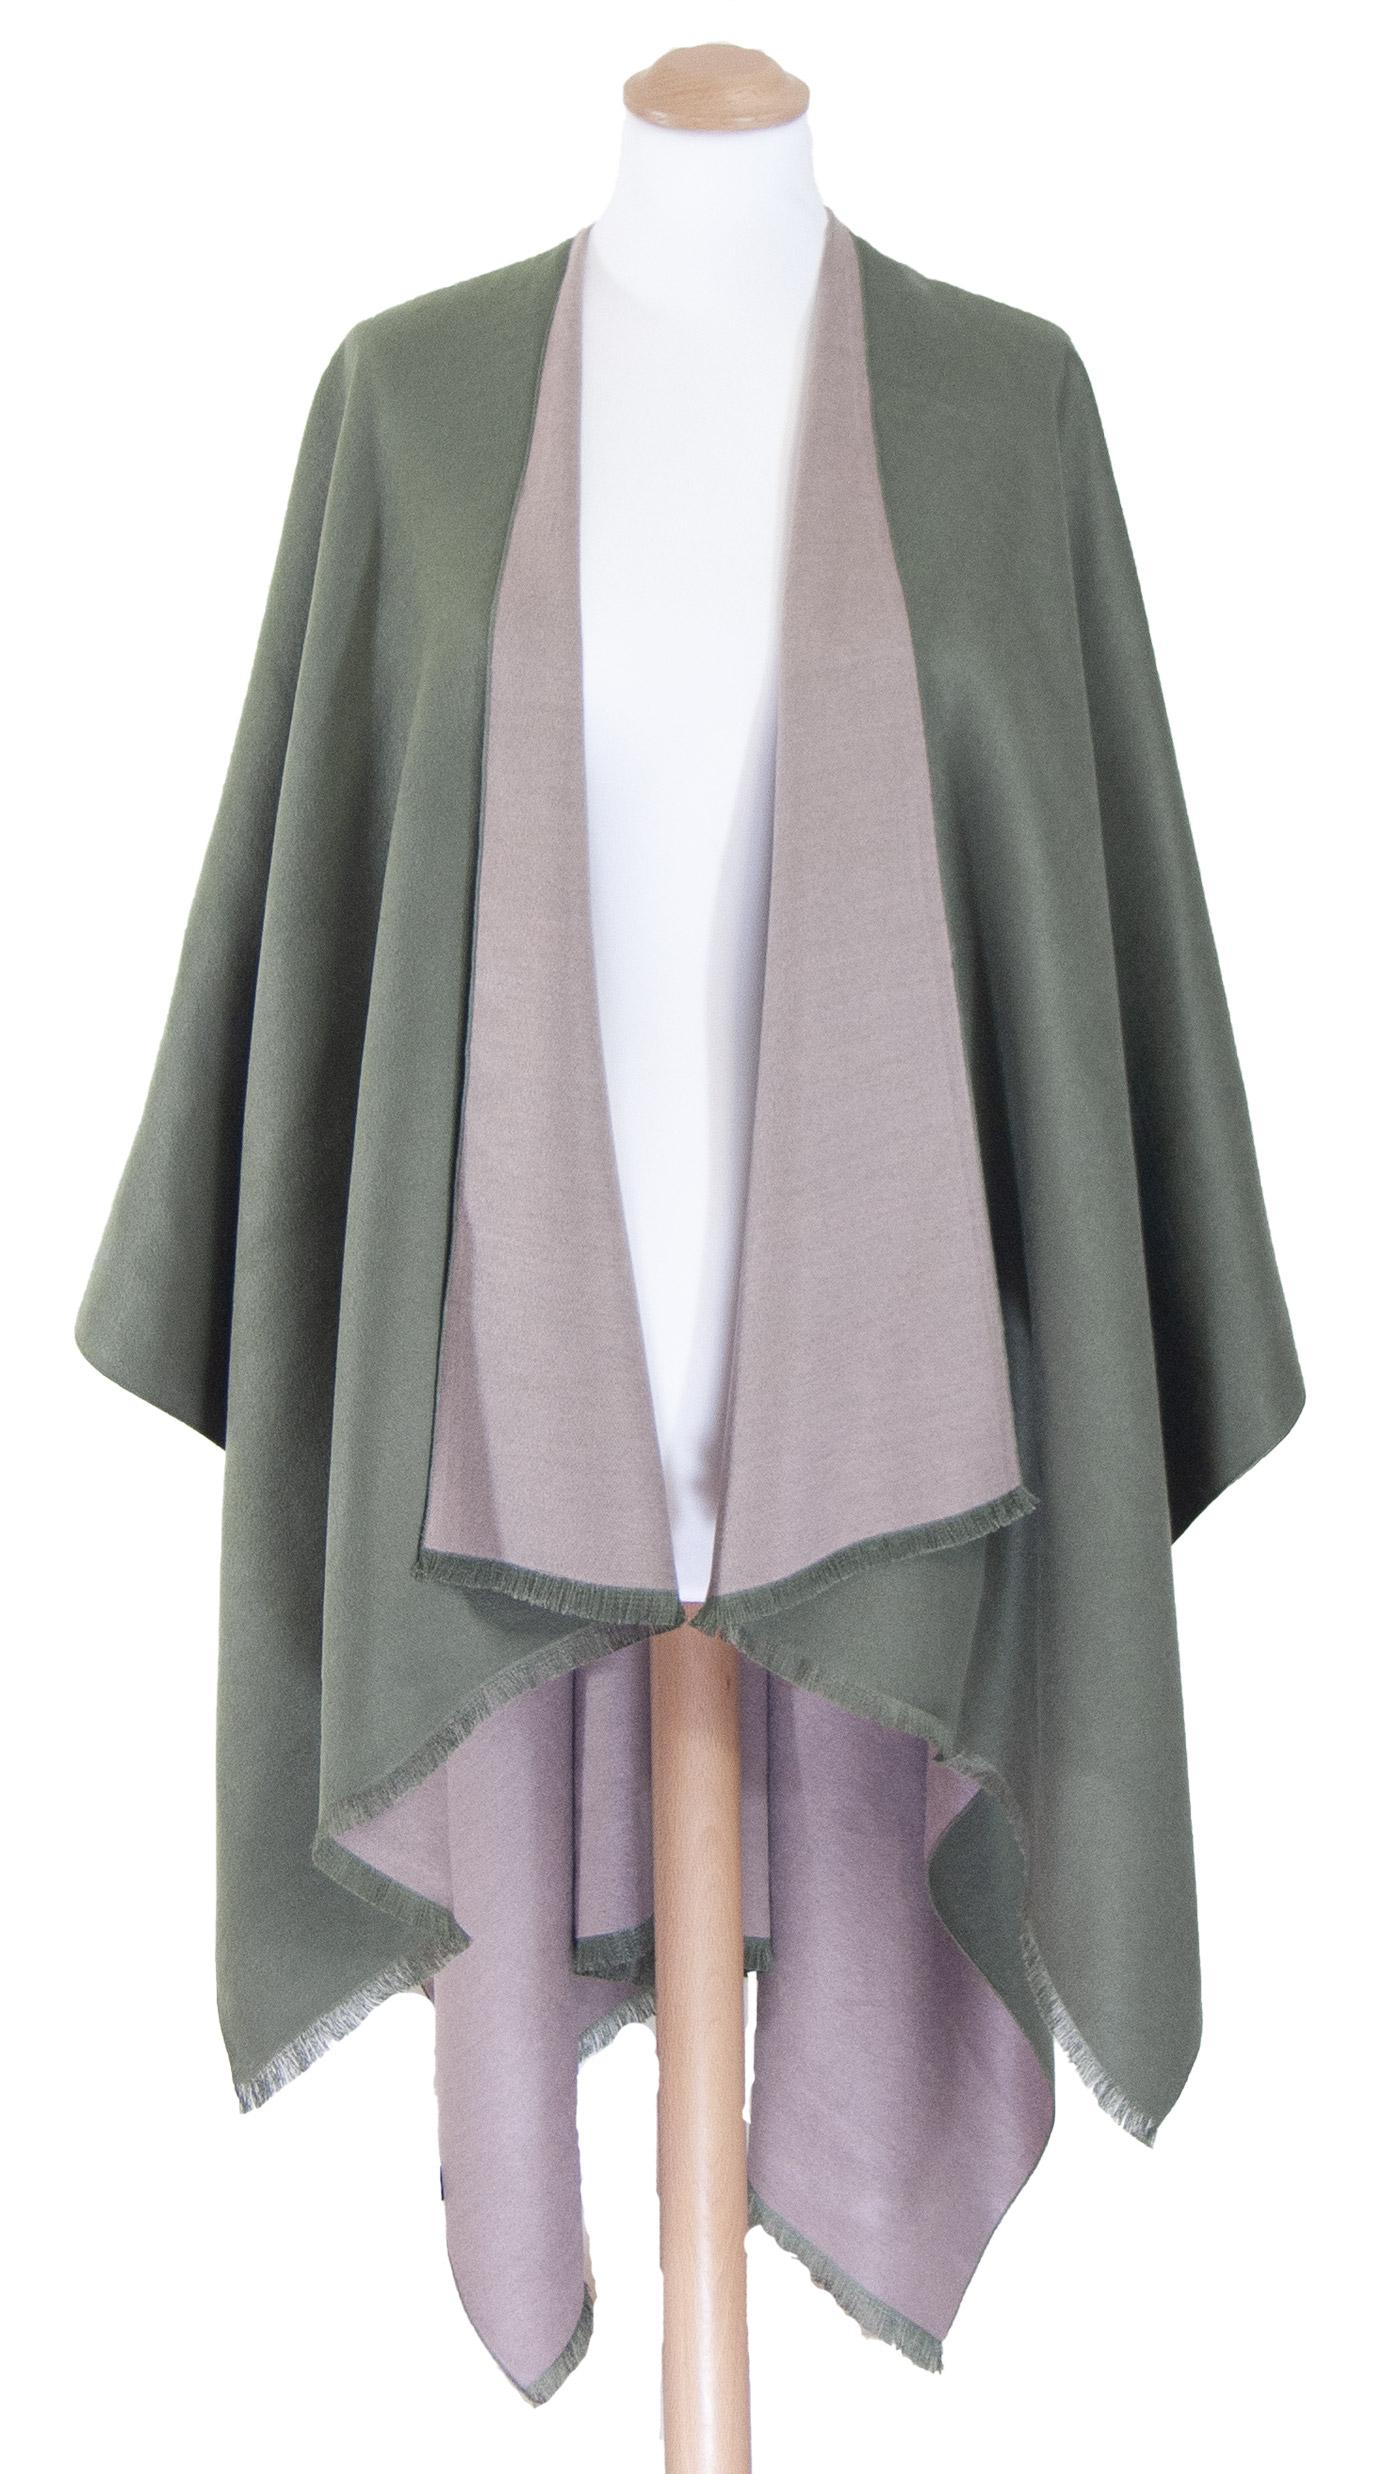 Poncho vert kaki rose grisé réversible